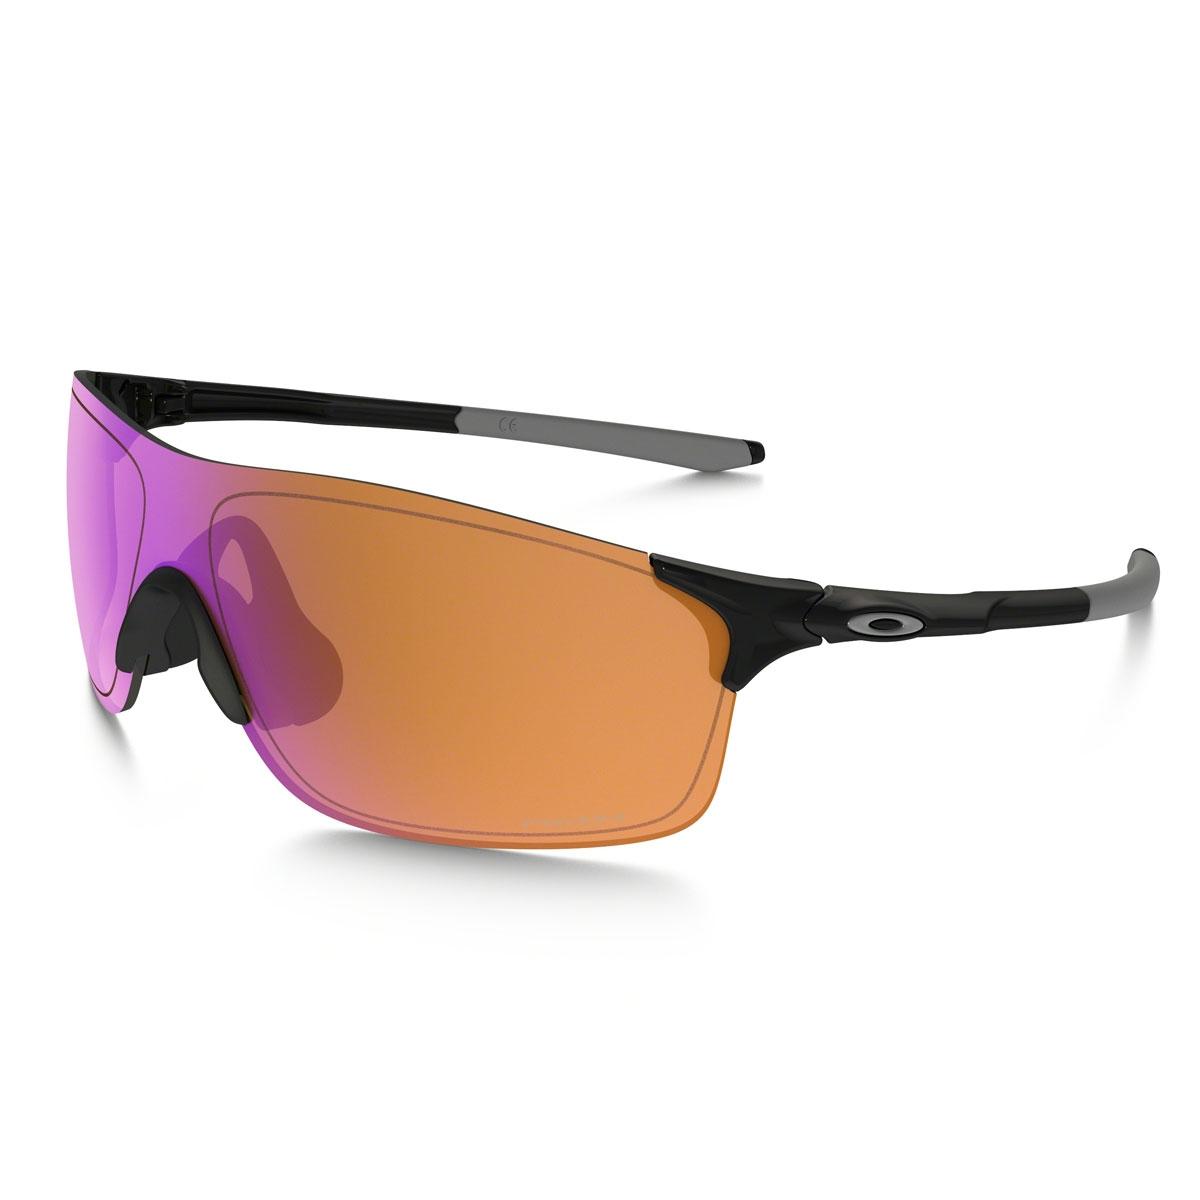 a2c811b6955 Image of Oakley EVZero Pitch Prizm Trail Sunglasses - Polished Black Prizm  Trail